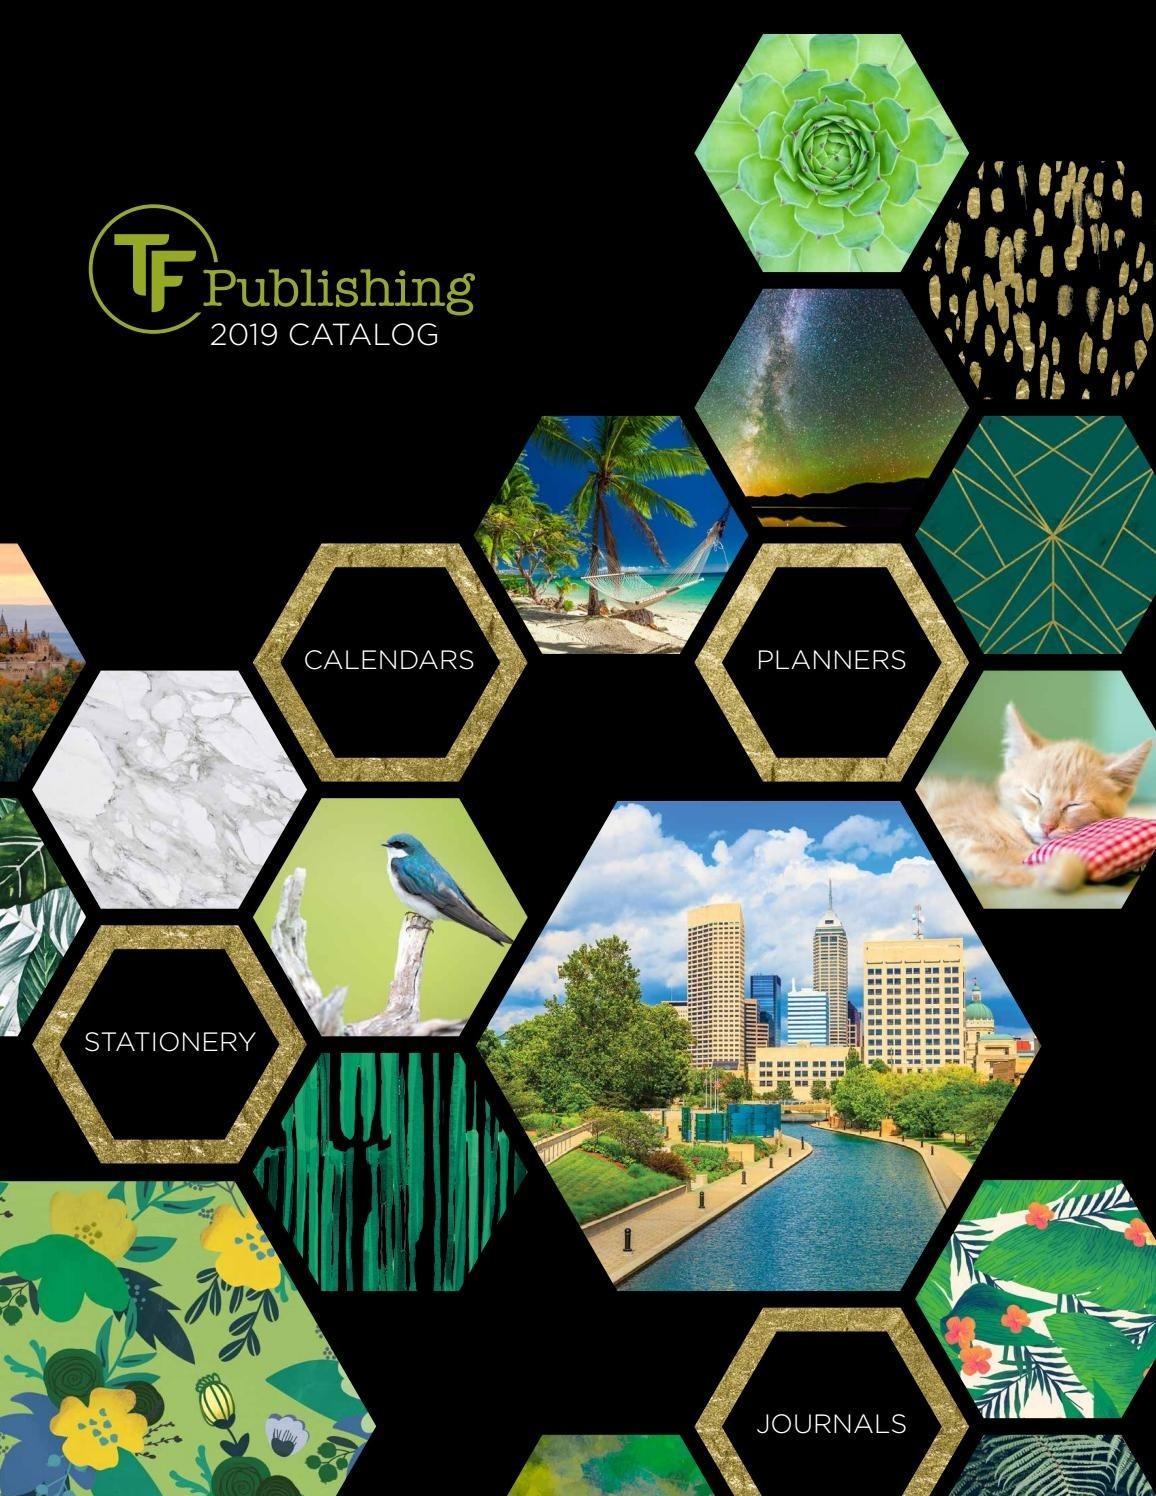 2019 Tf Publishing Catalogtf Publishing - Issuu  Small Mini Checkbook Size Calenders